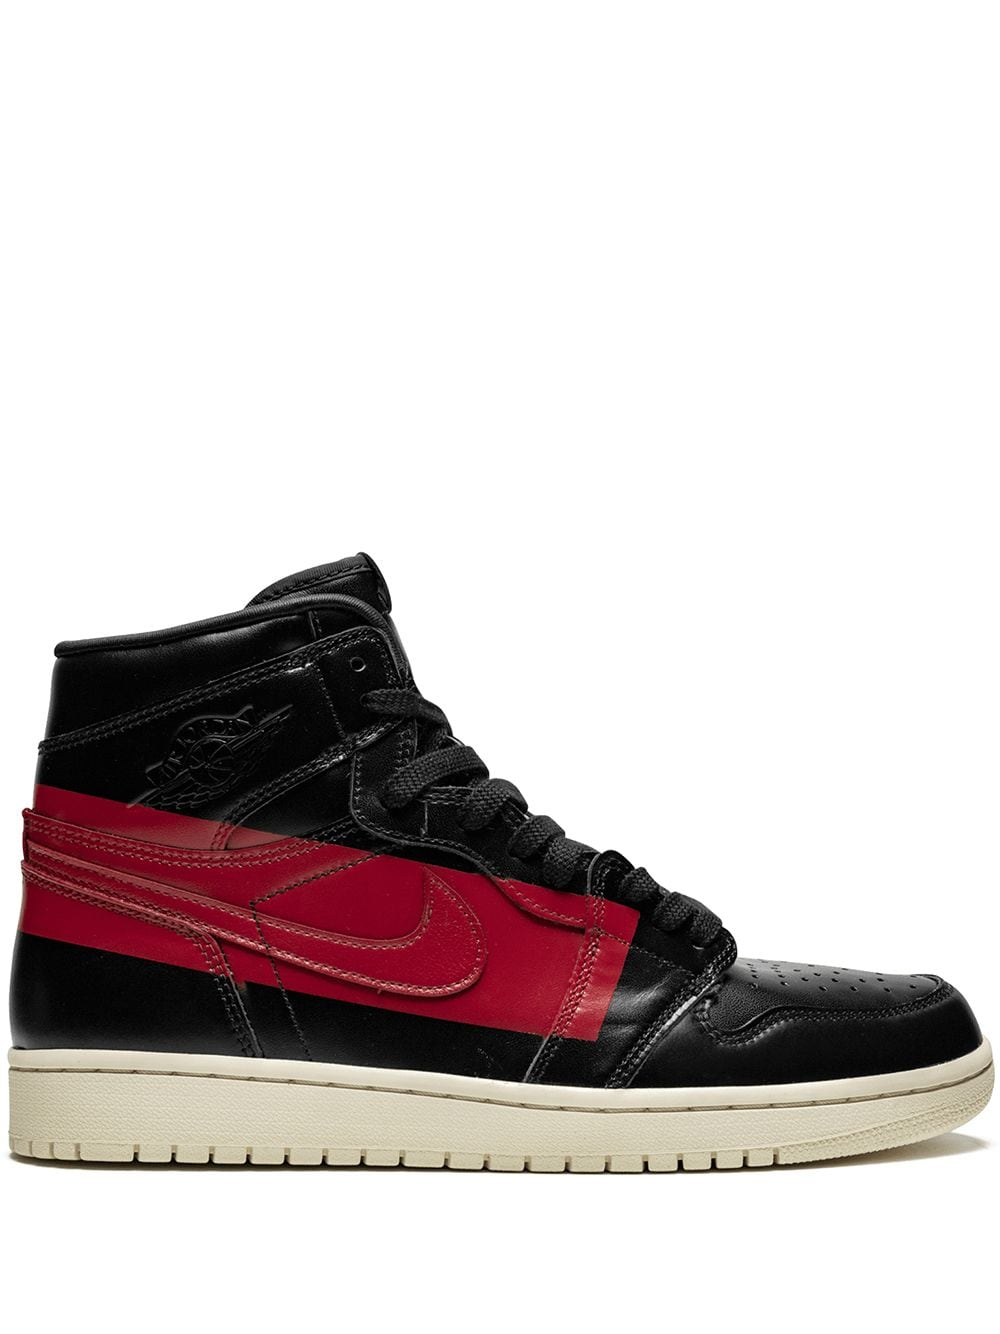 quality design 9660c f6b0f Jordan Air Jordan 1 High OG Defiant sneakers - Schwarz von Jordan